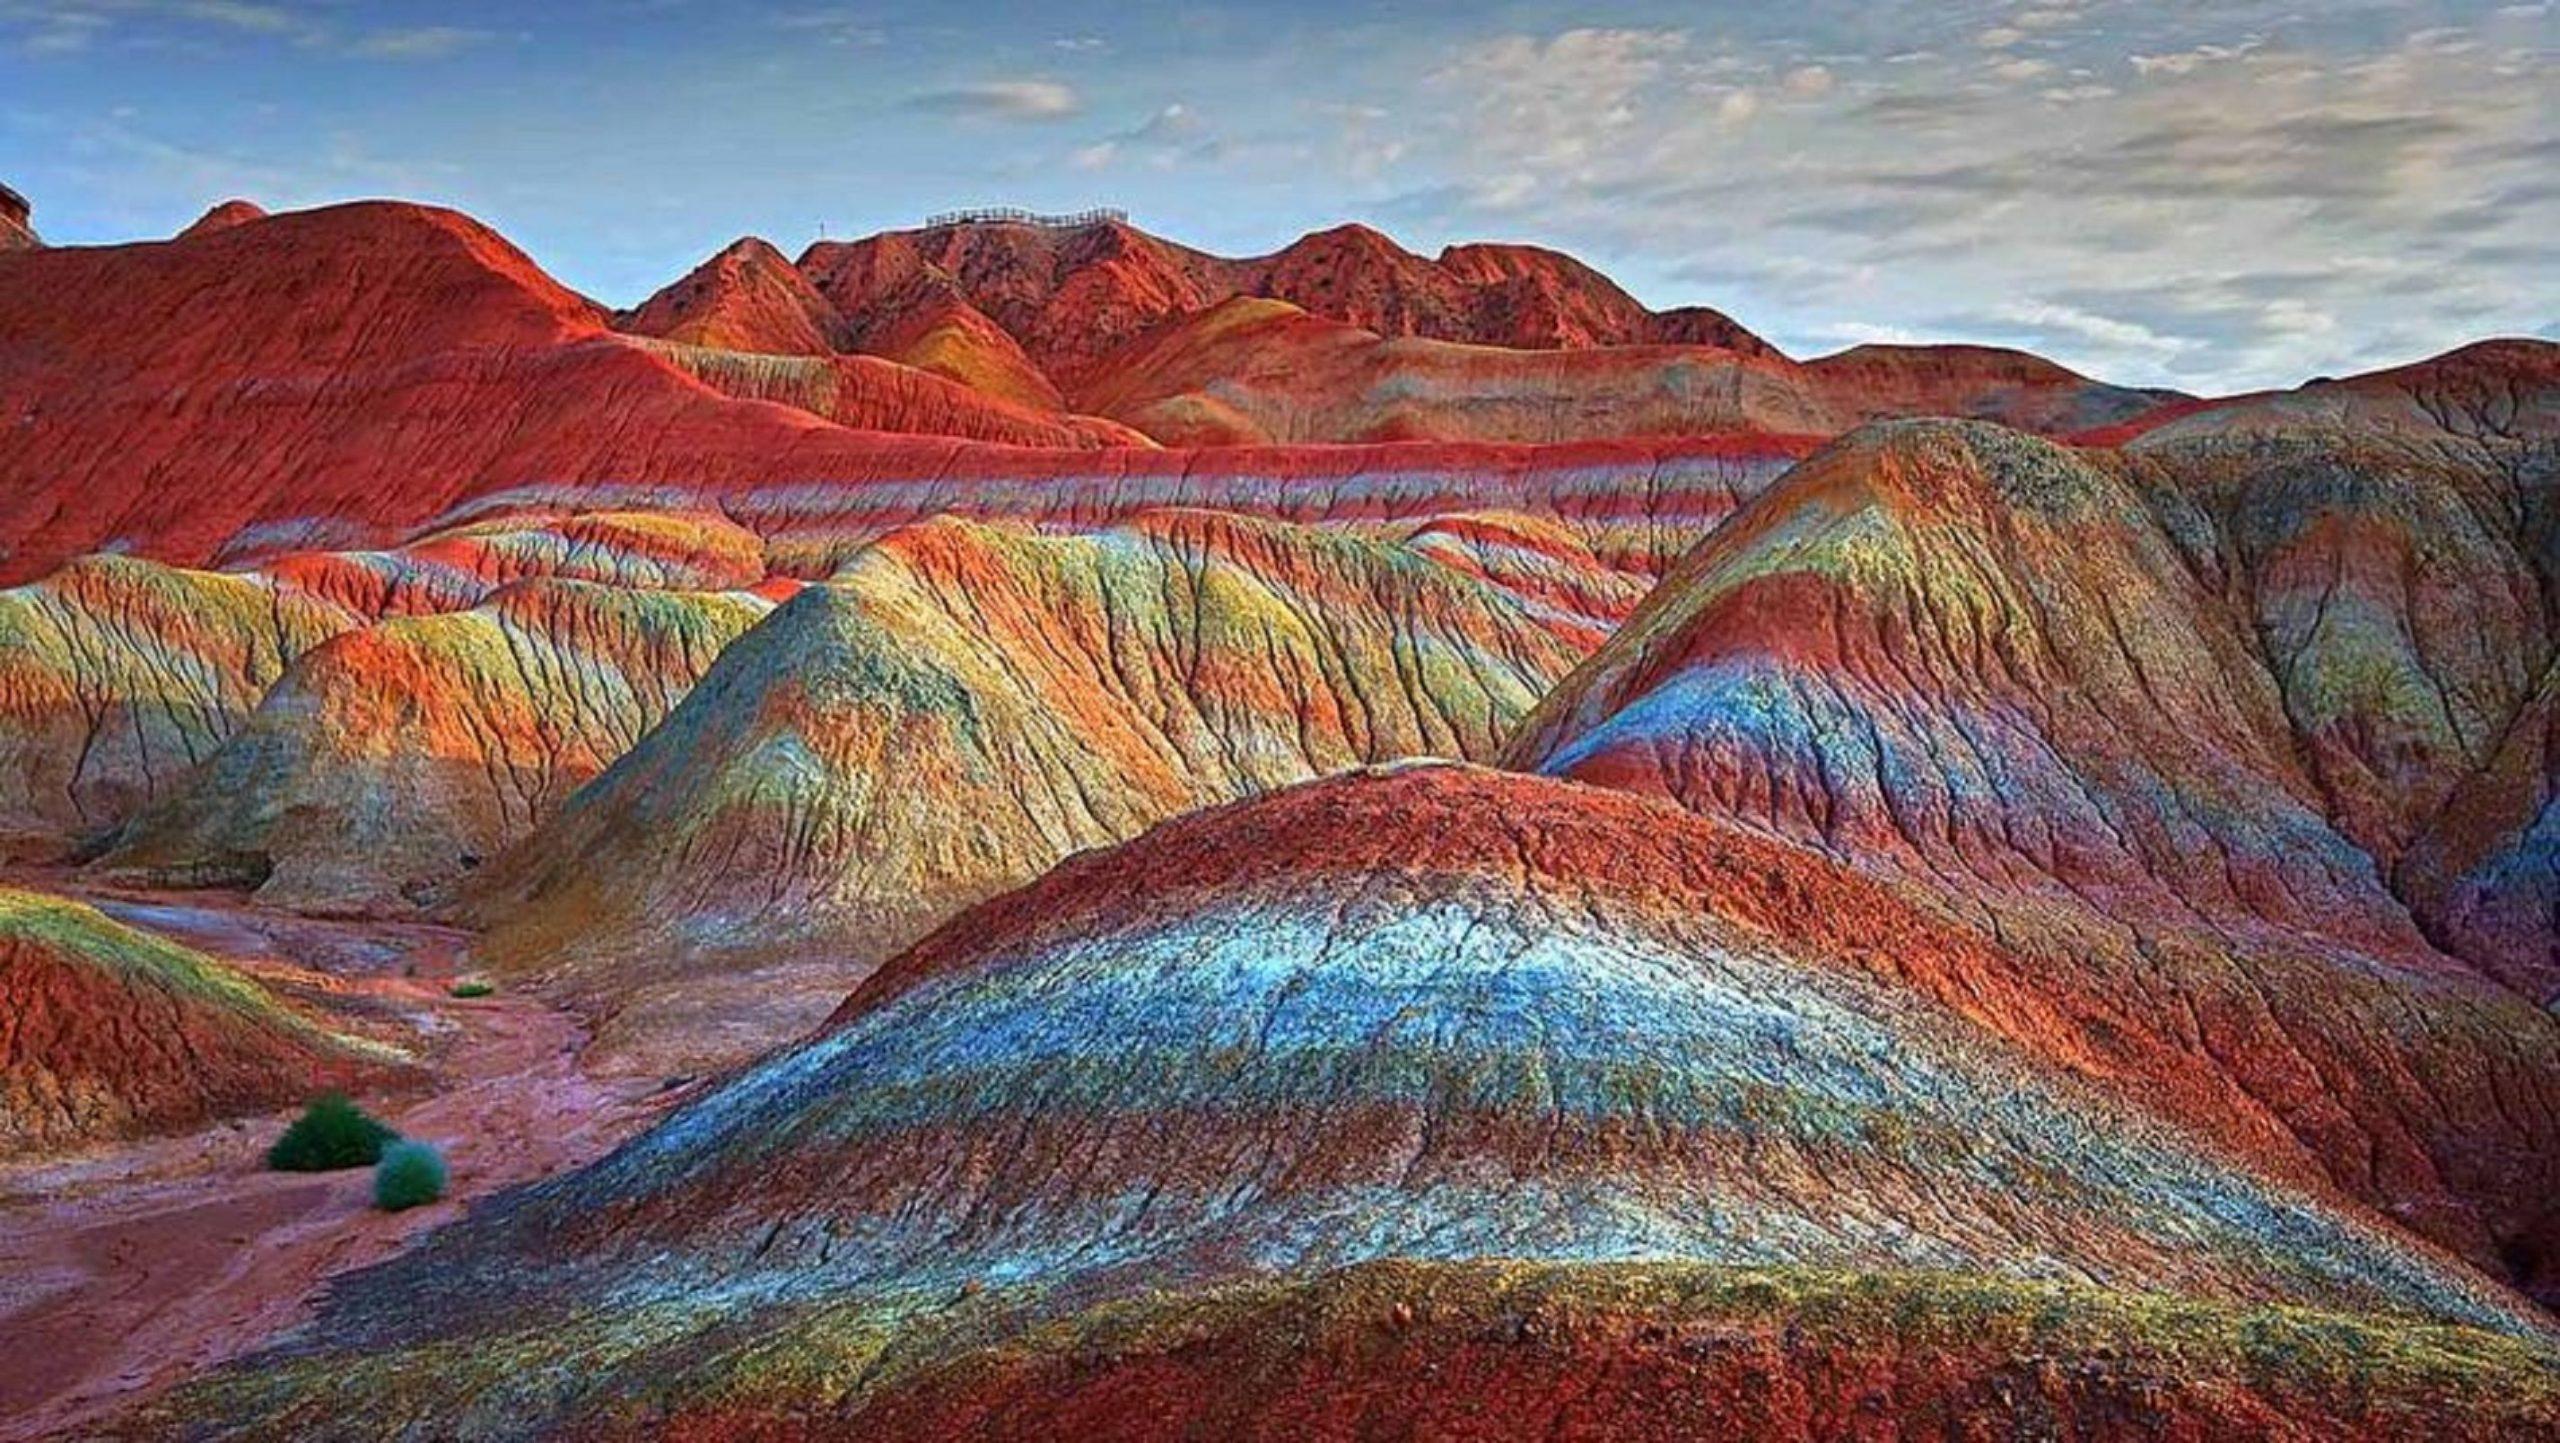 Zhangye Danxia Landform - The Rainbow Mountains of China